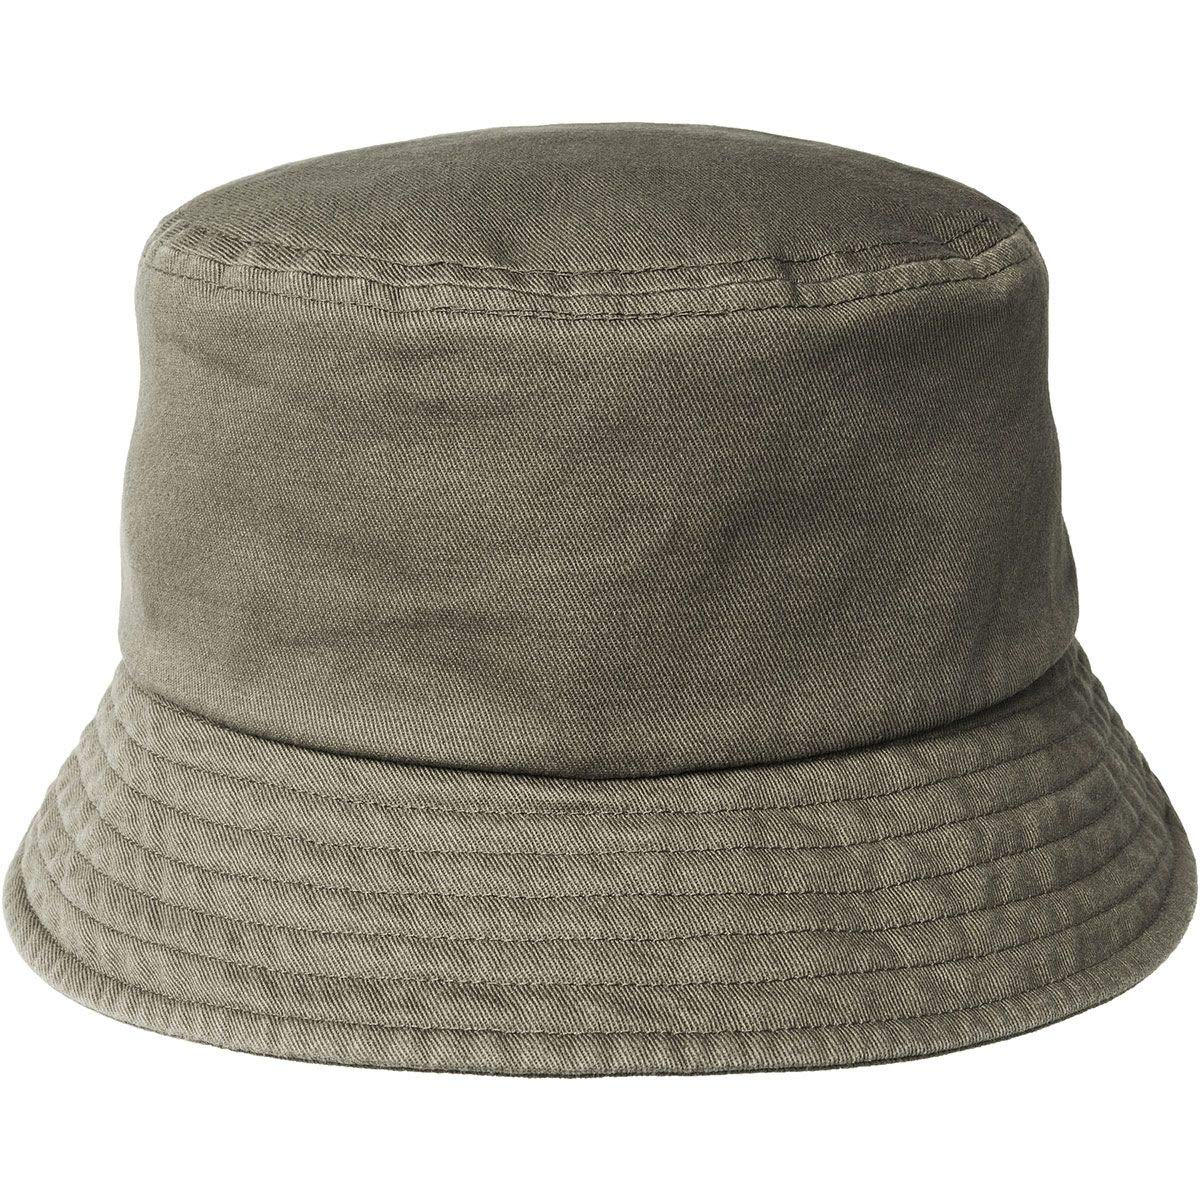 b12b96bb Kangol Mens Washed Cotton Bucket Hat Bucket Hat: Amazon.ca: Clothing &  Accessories